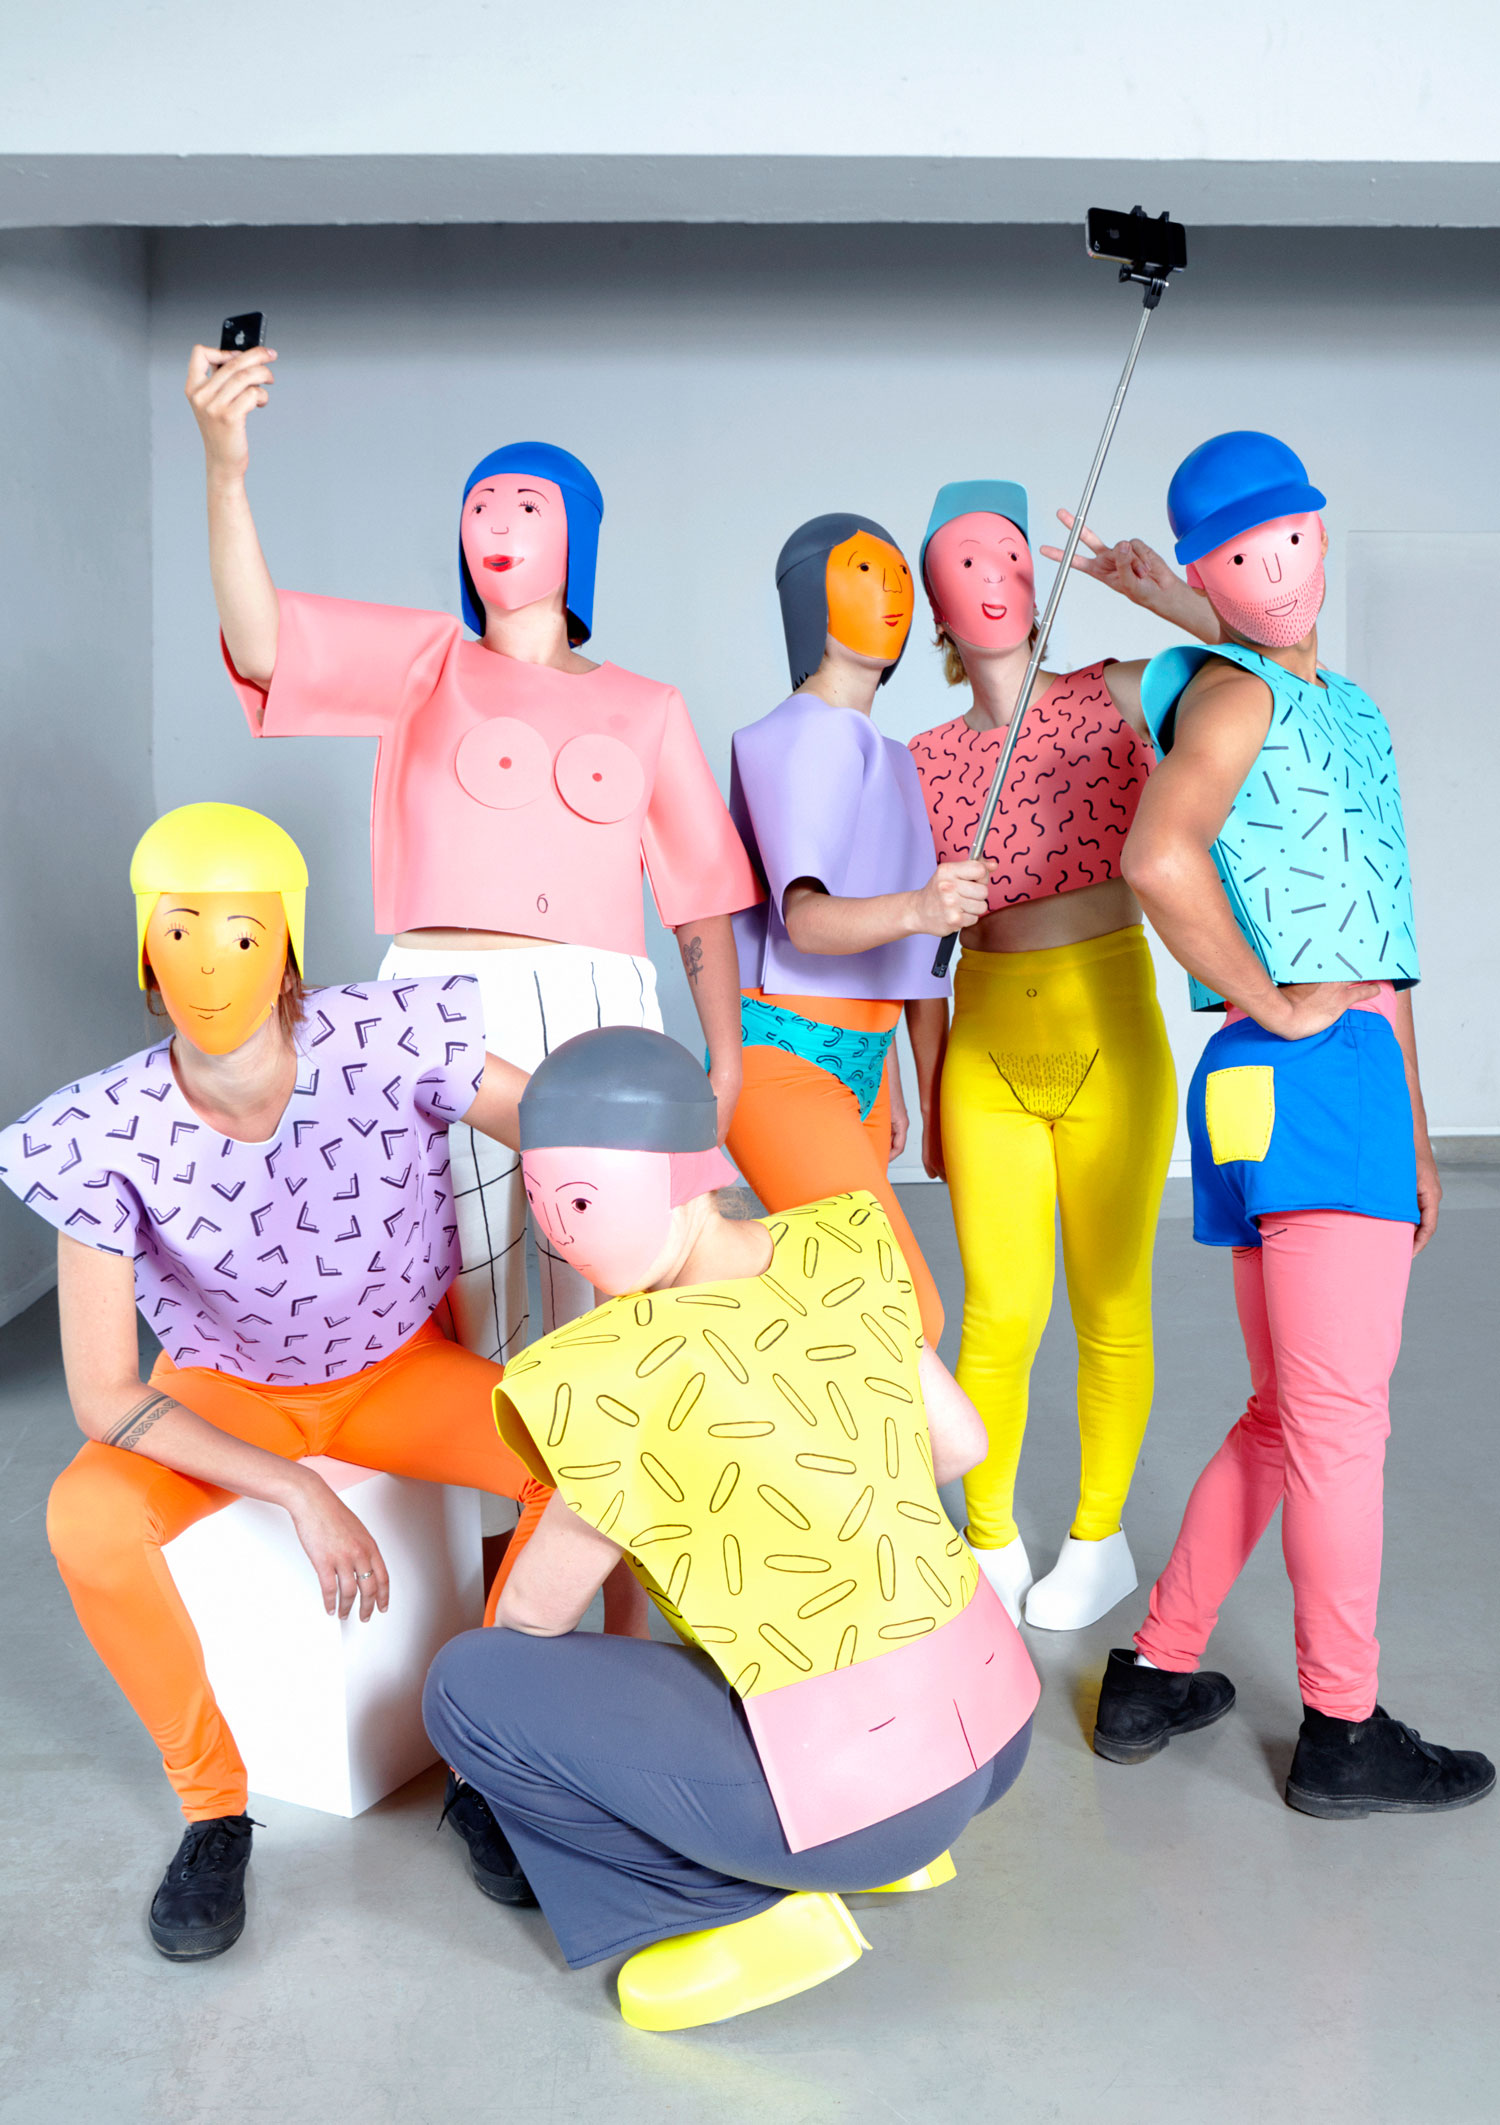 Design Academy Eindhoven 2016 Graduation Show, Aina Seerden | Yellowtrace